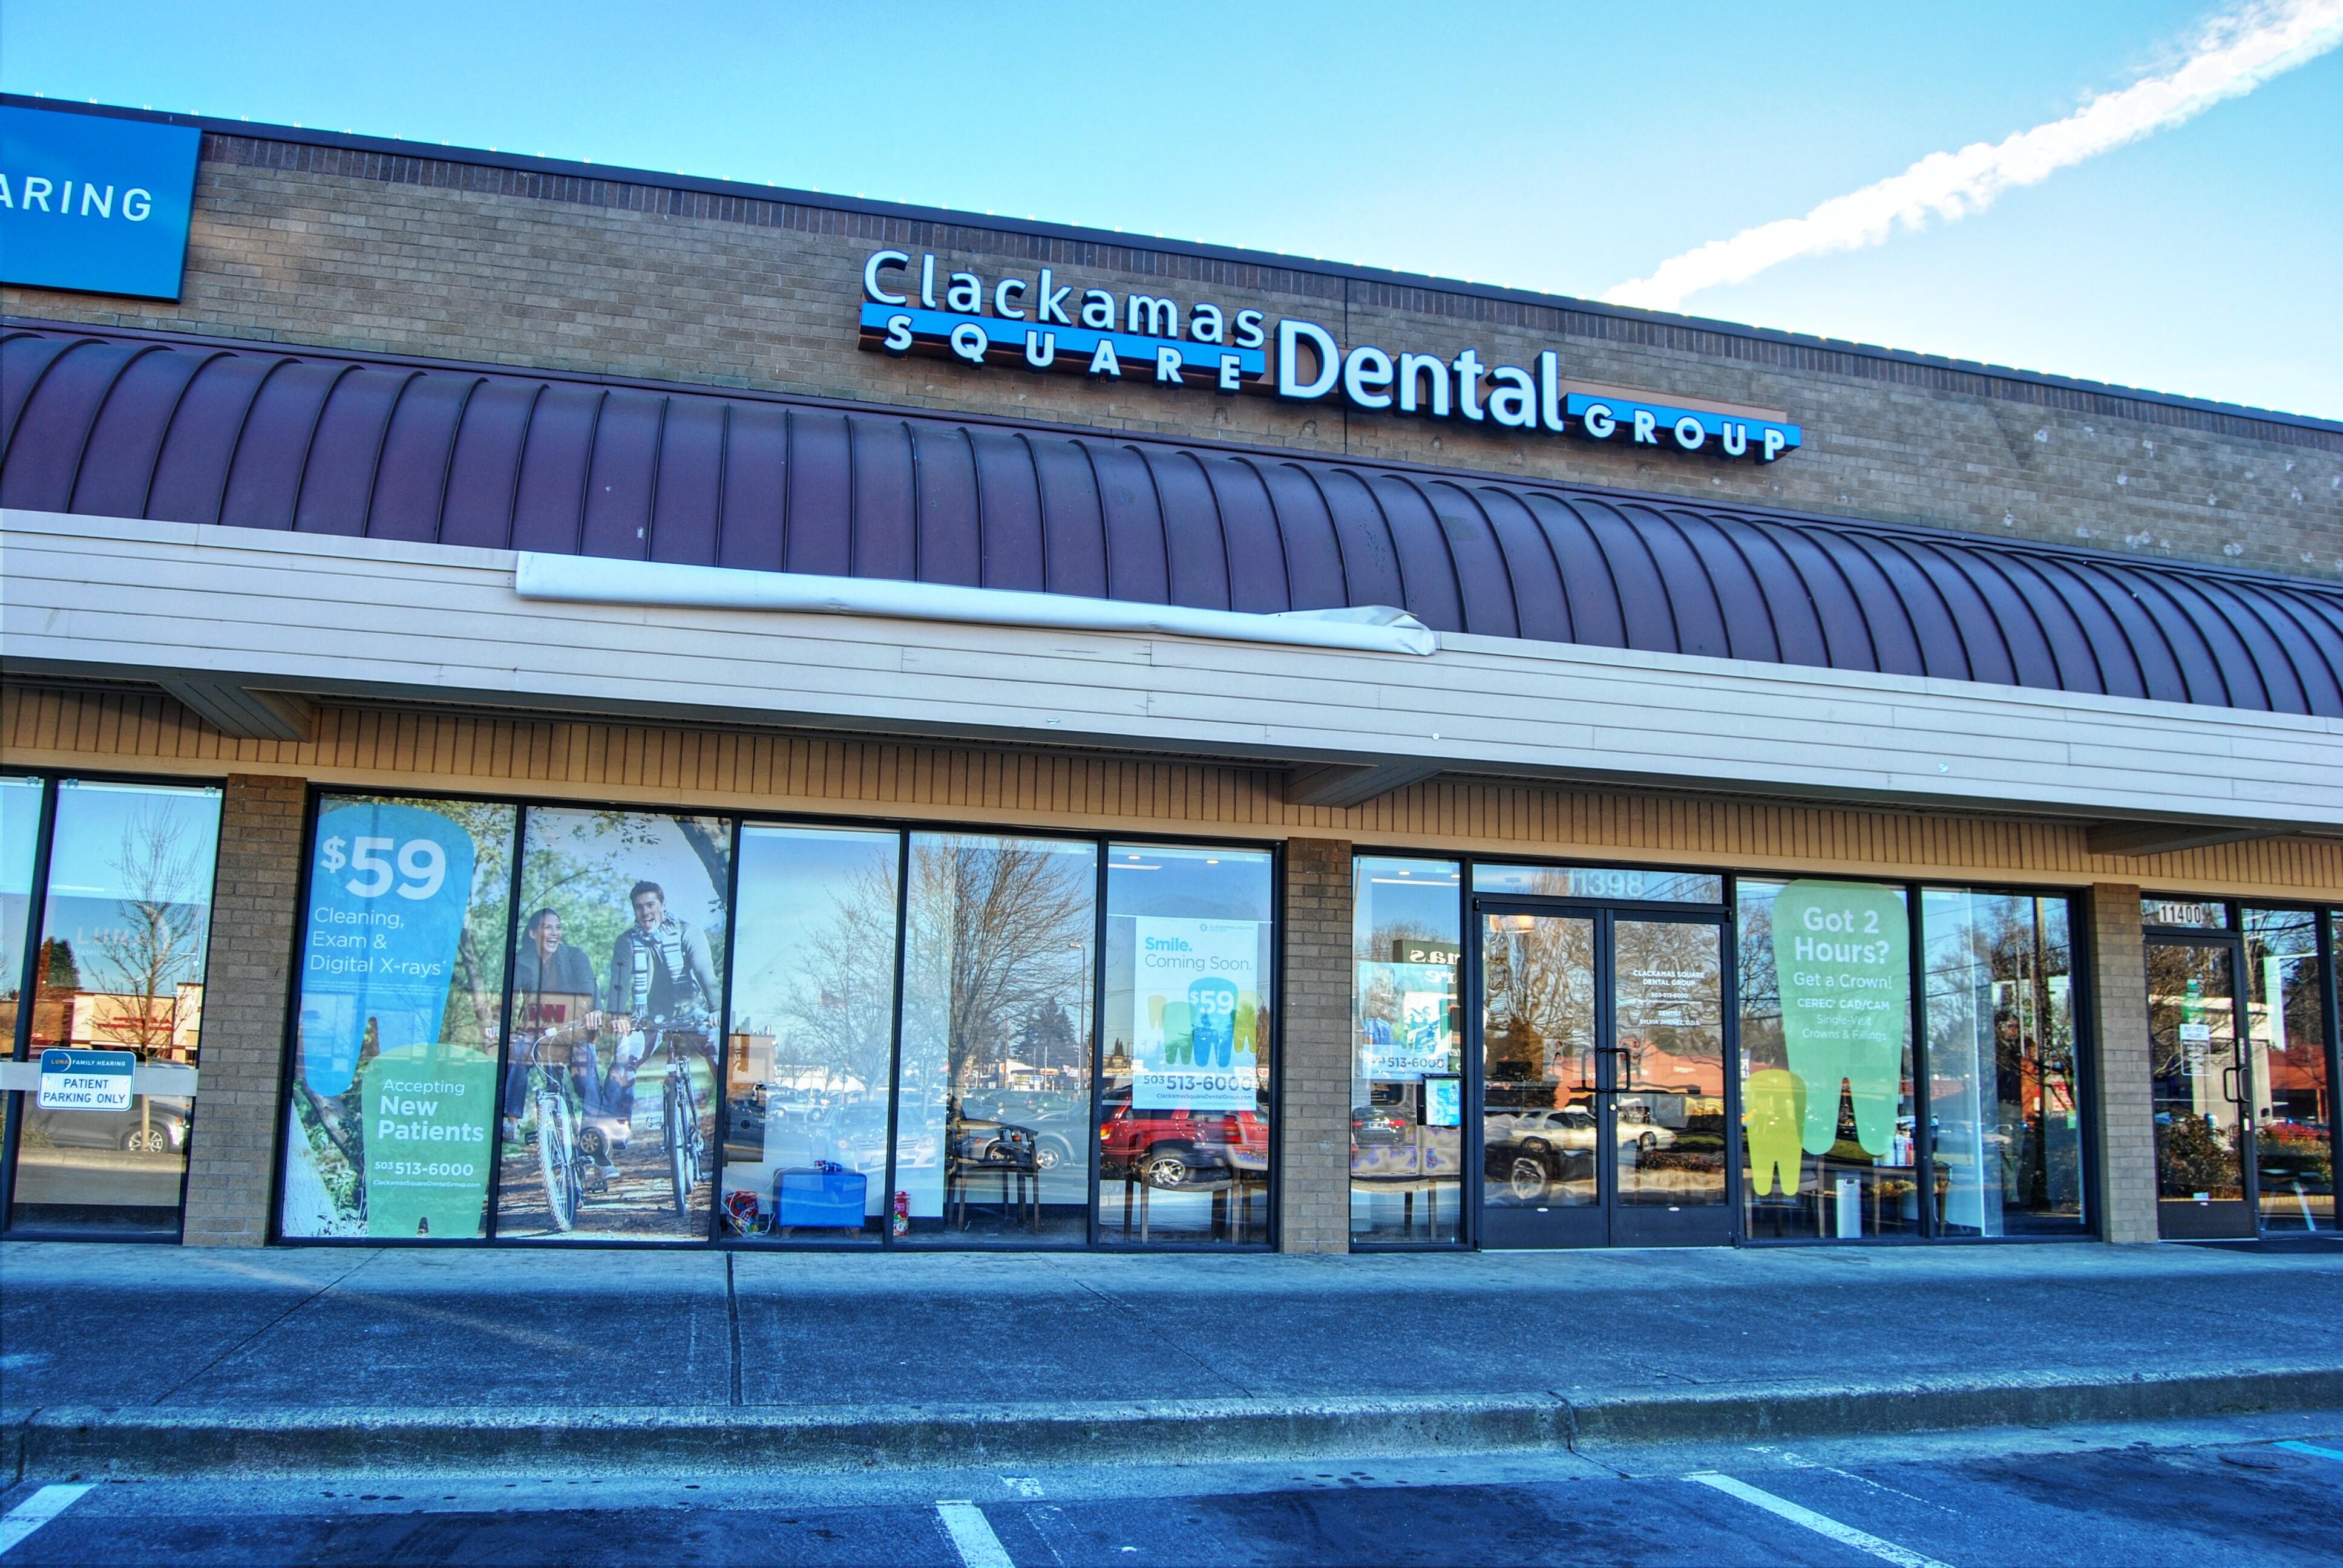 Clackamas Square Dental Group - ad image